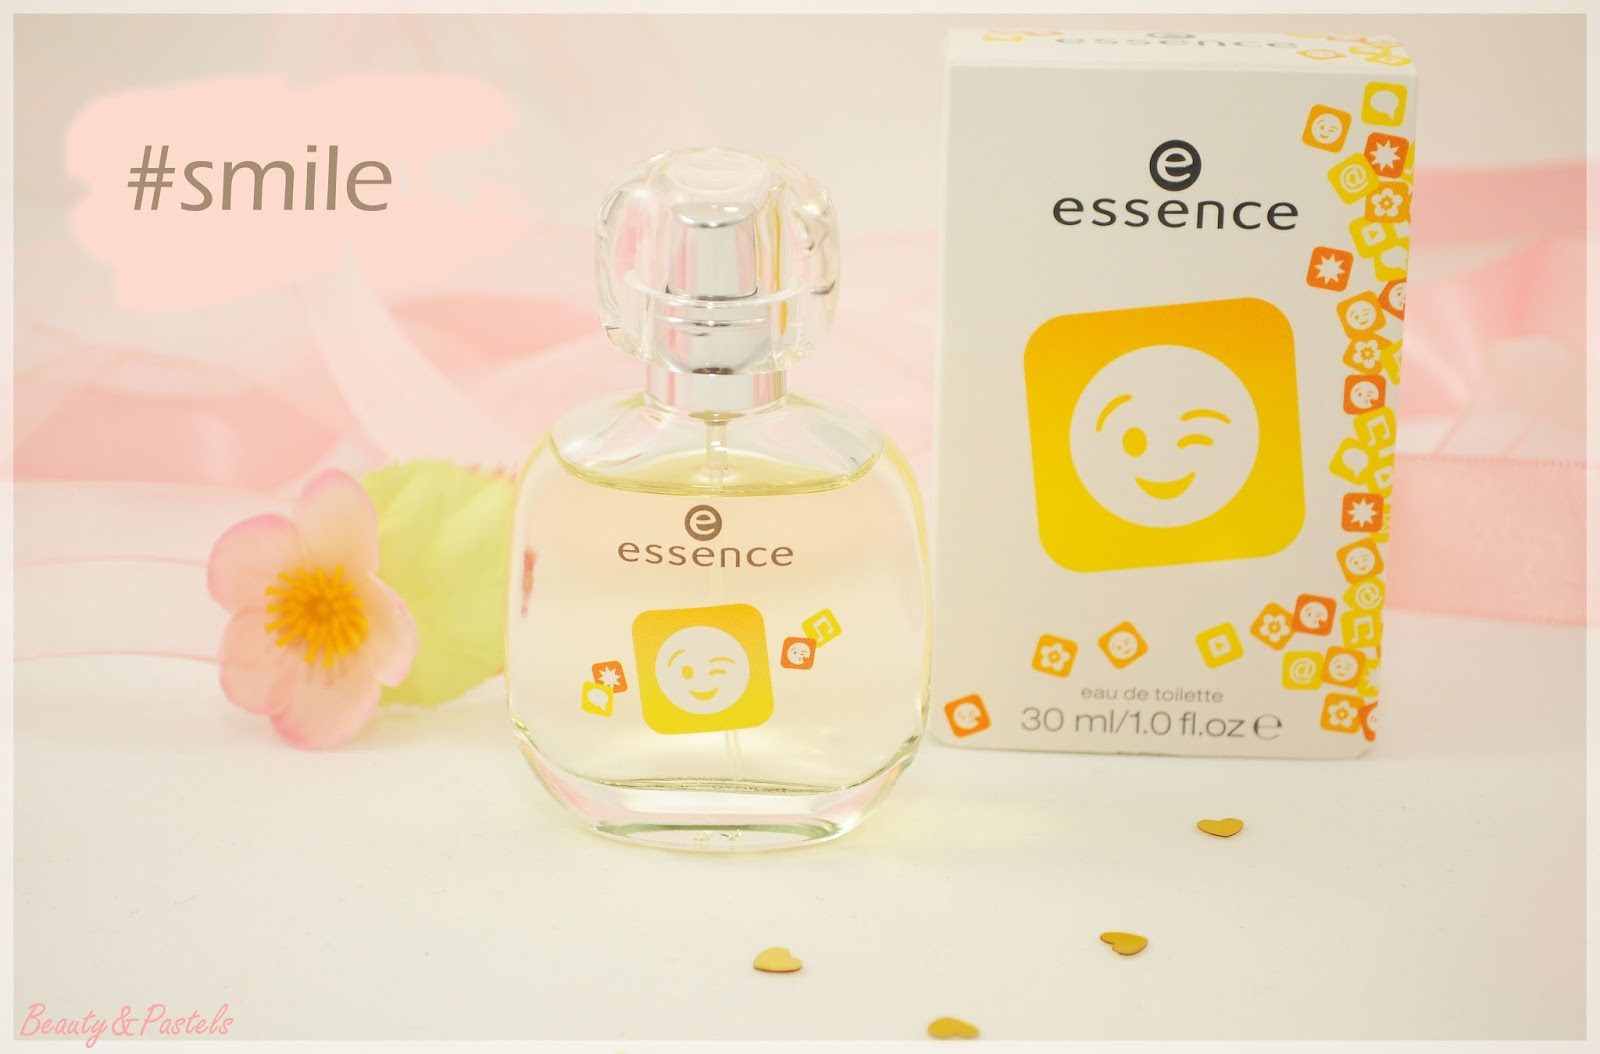 essence-Duft-smile